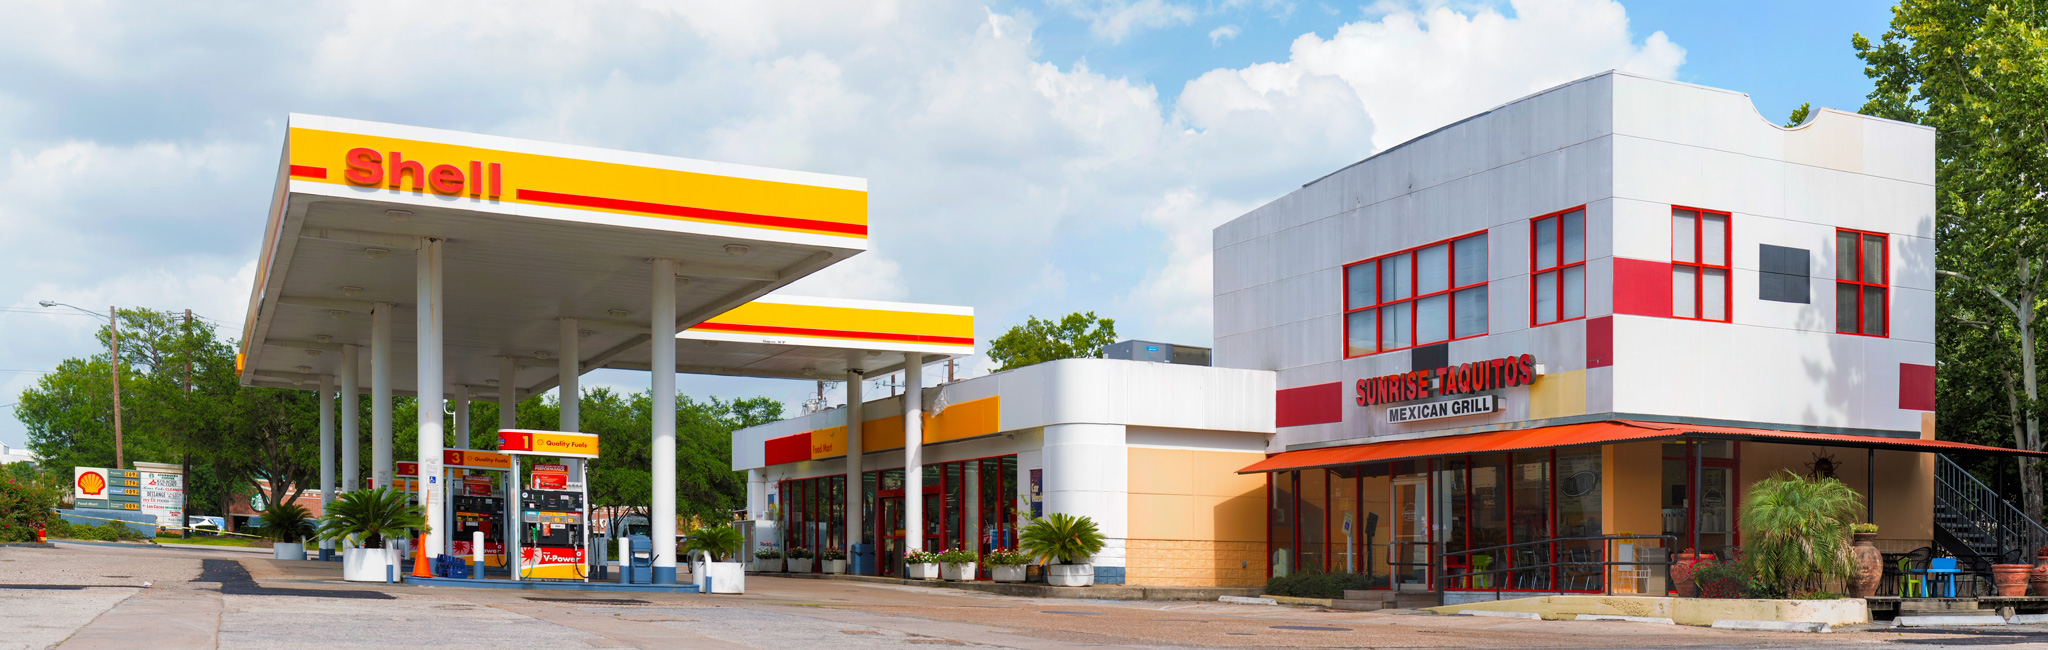 Sunrise Taquitos / Shell Station